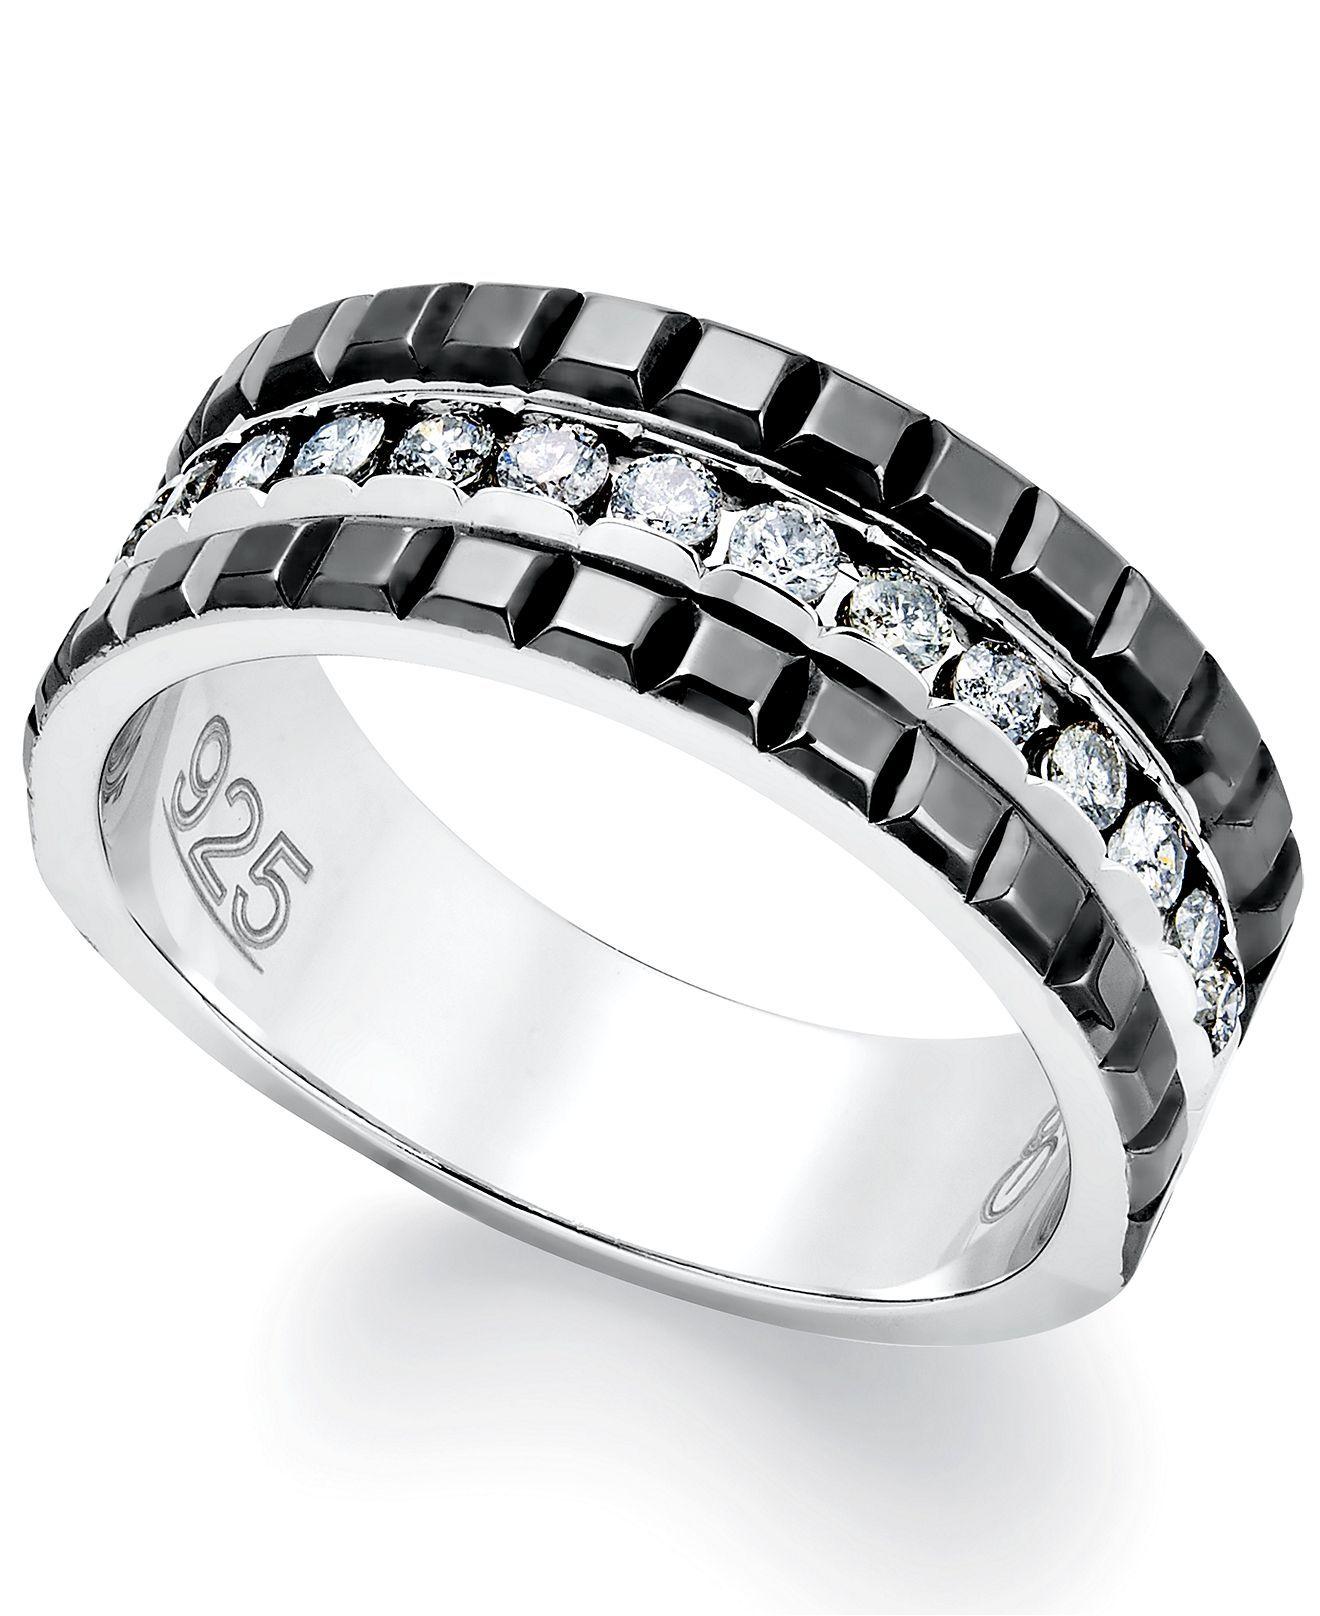 Mens Diamond Ring Sterling Silver and 2 Row Black Enamel Diamond